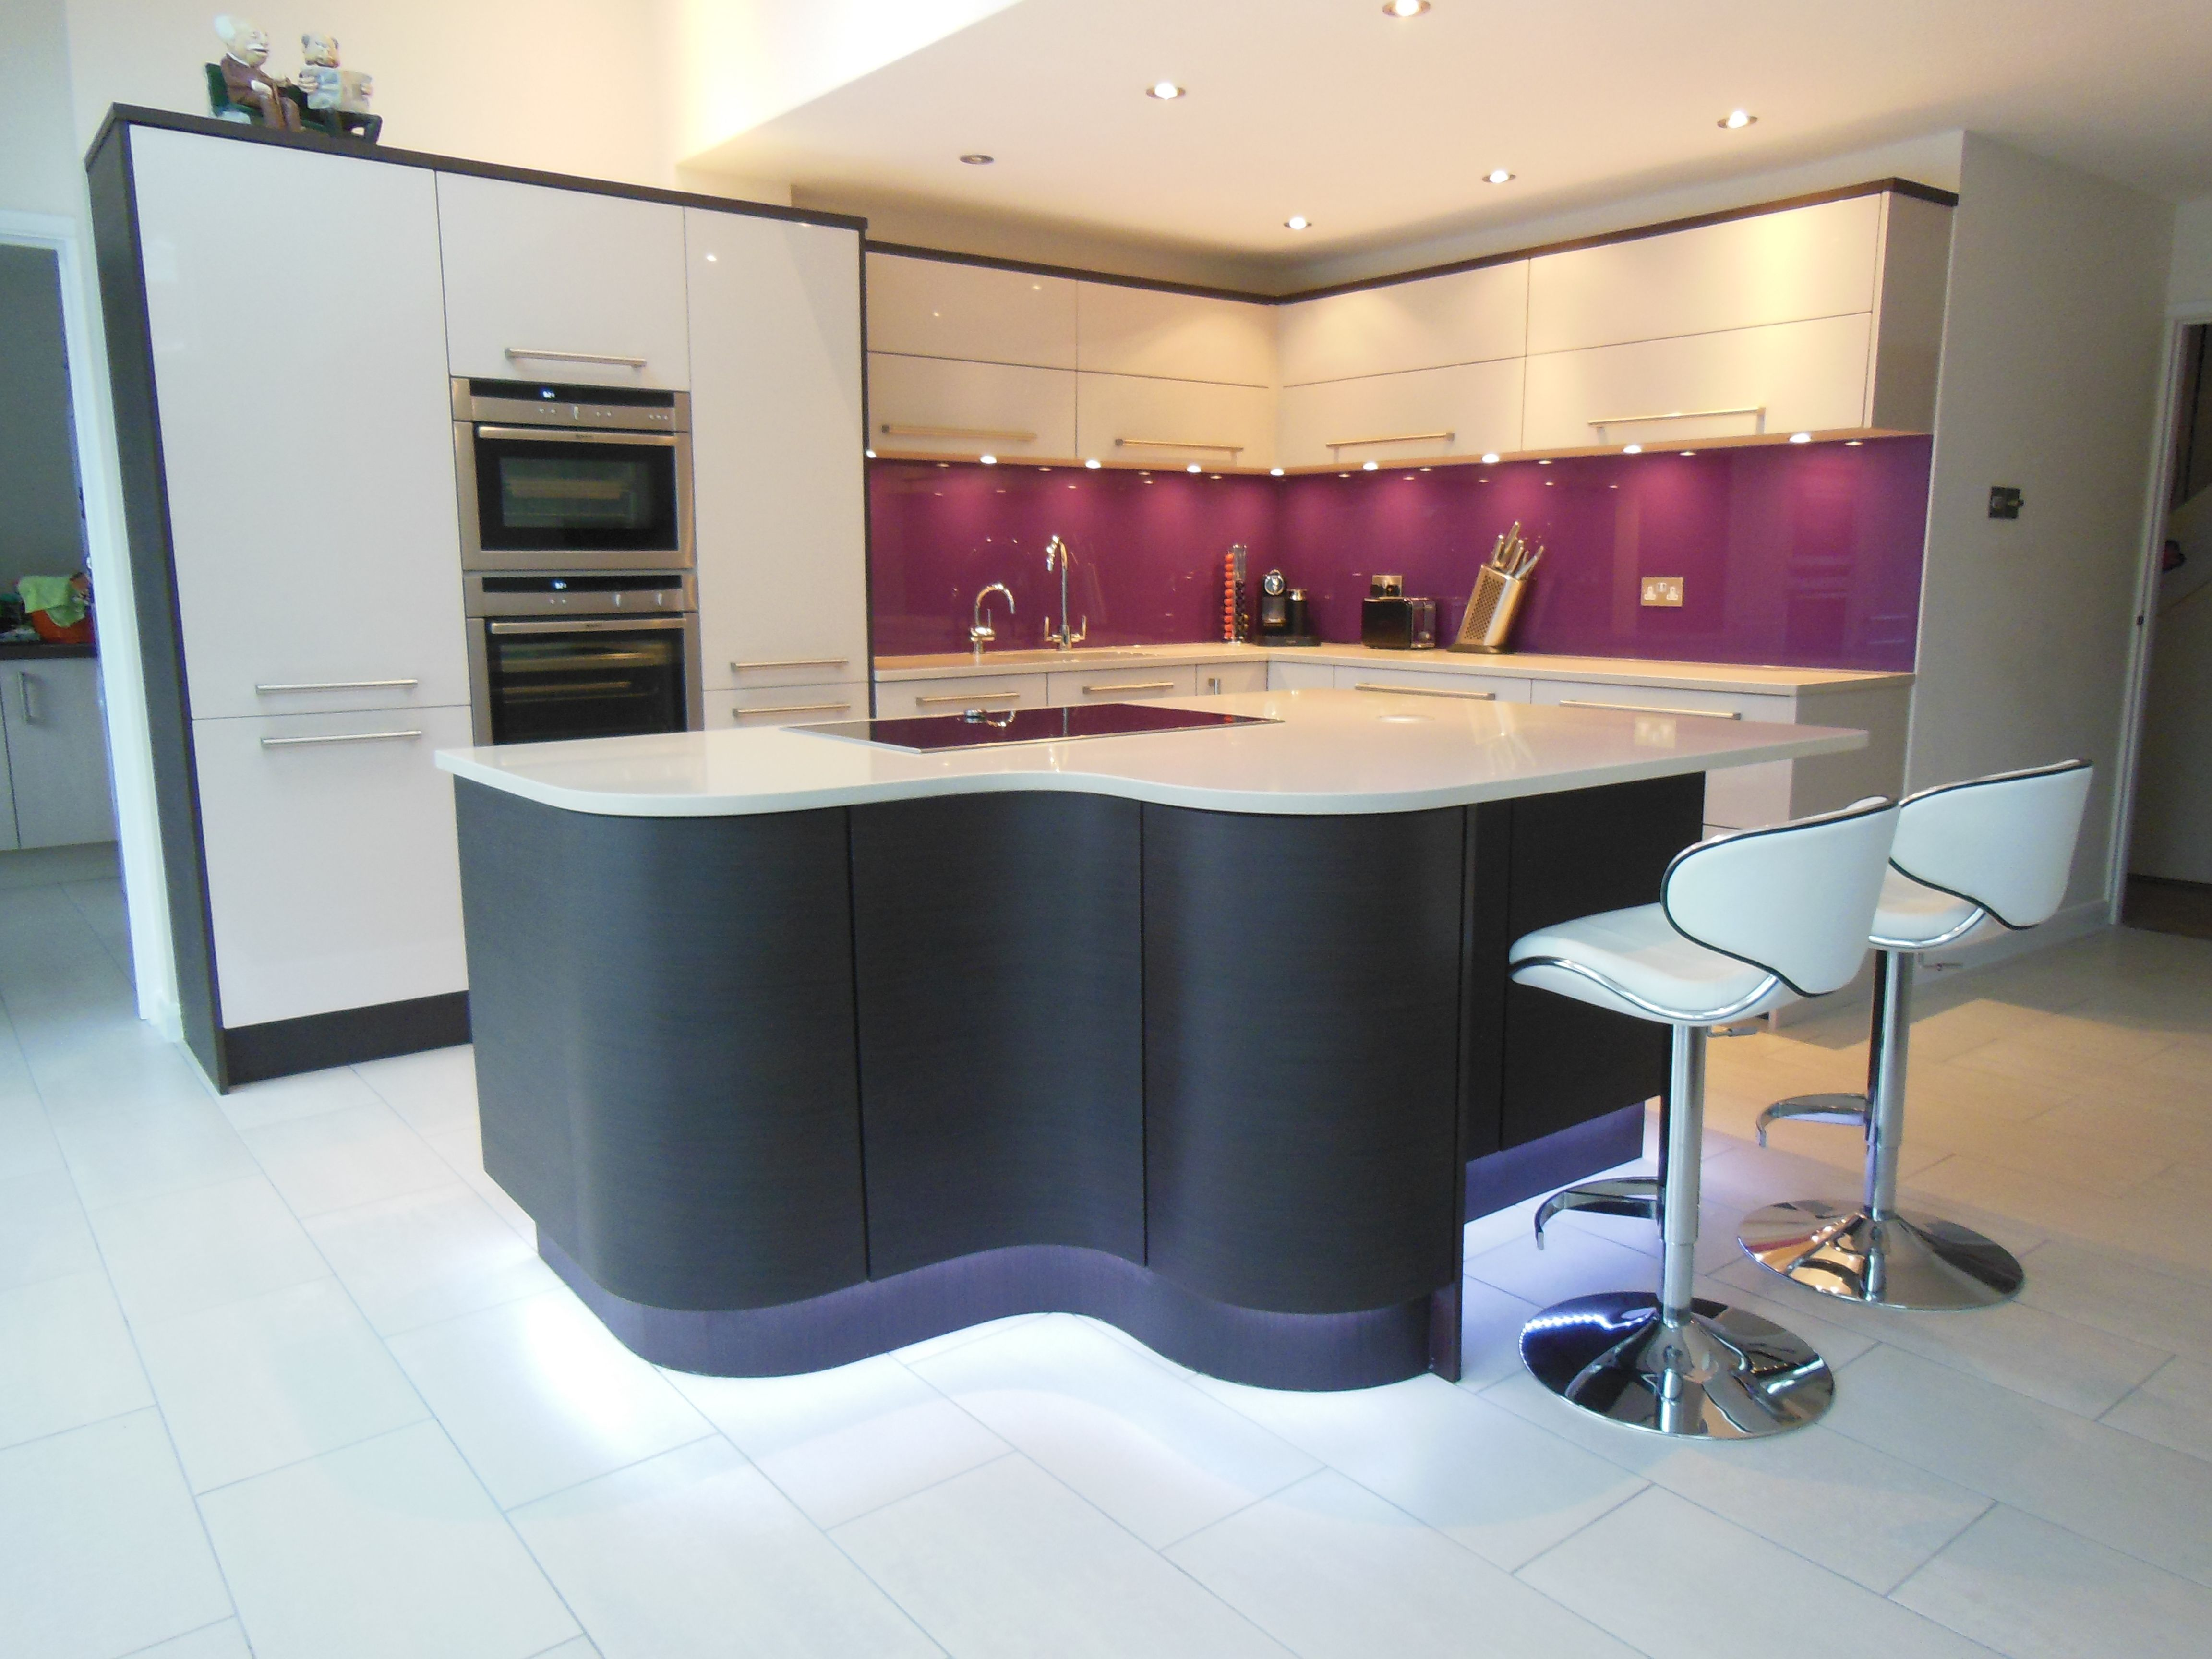 Elements Kitchen Design - Bespoke Kitchen | elements bespoke ...